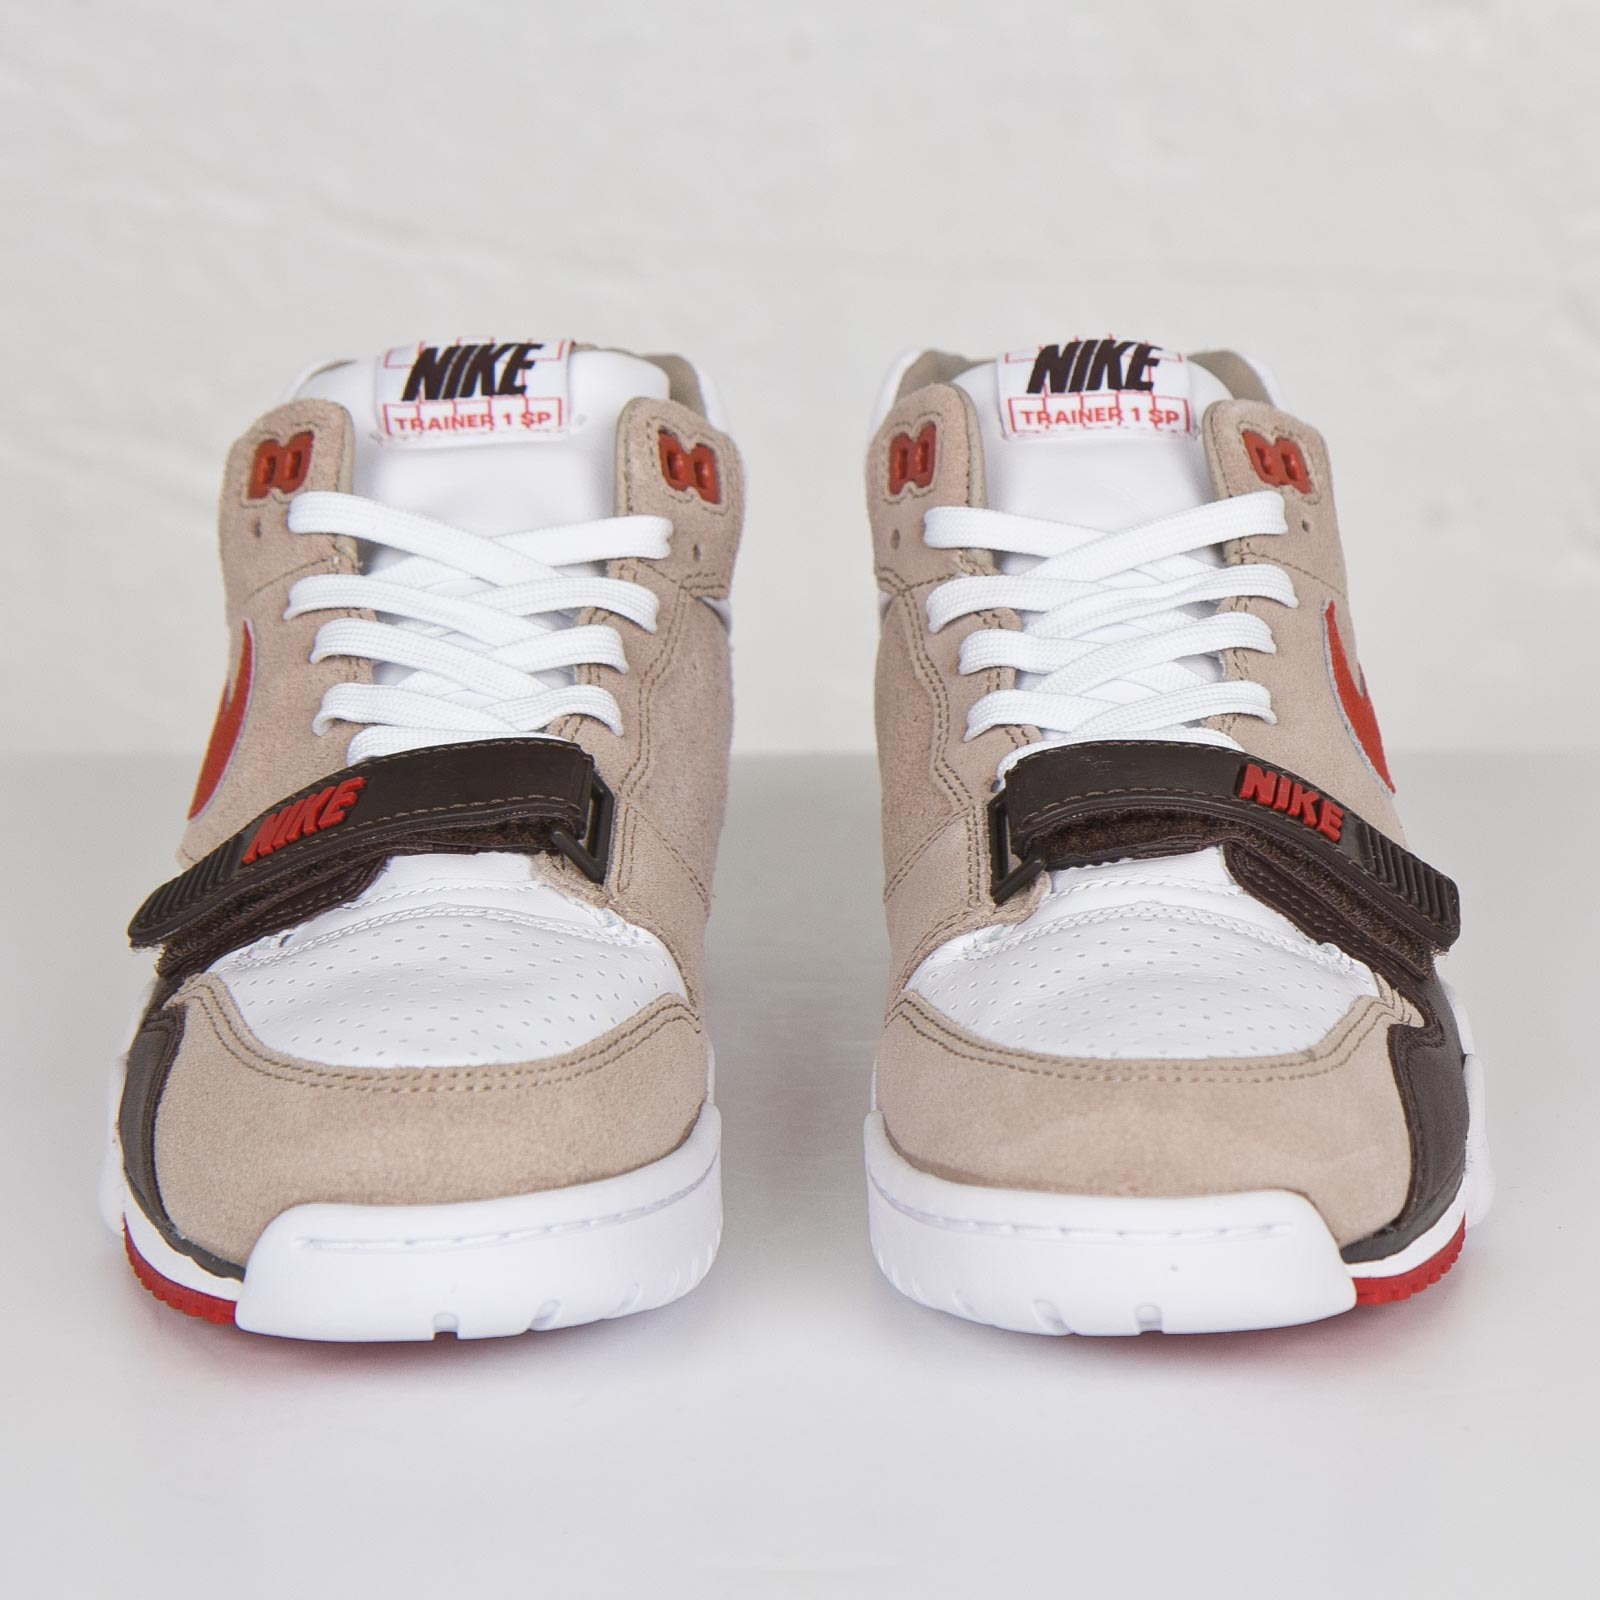 8812875c3313 Nike Air Trainer 1 Mid SP   Fragment - 806942-282 - Sneakersnstuff ...